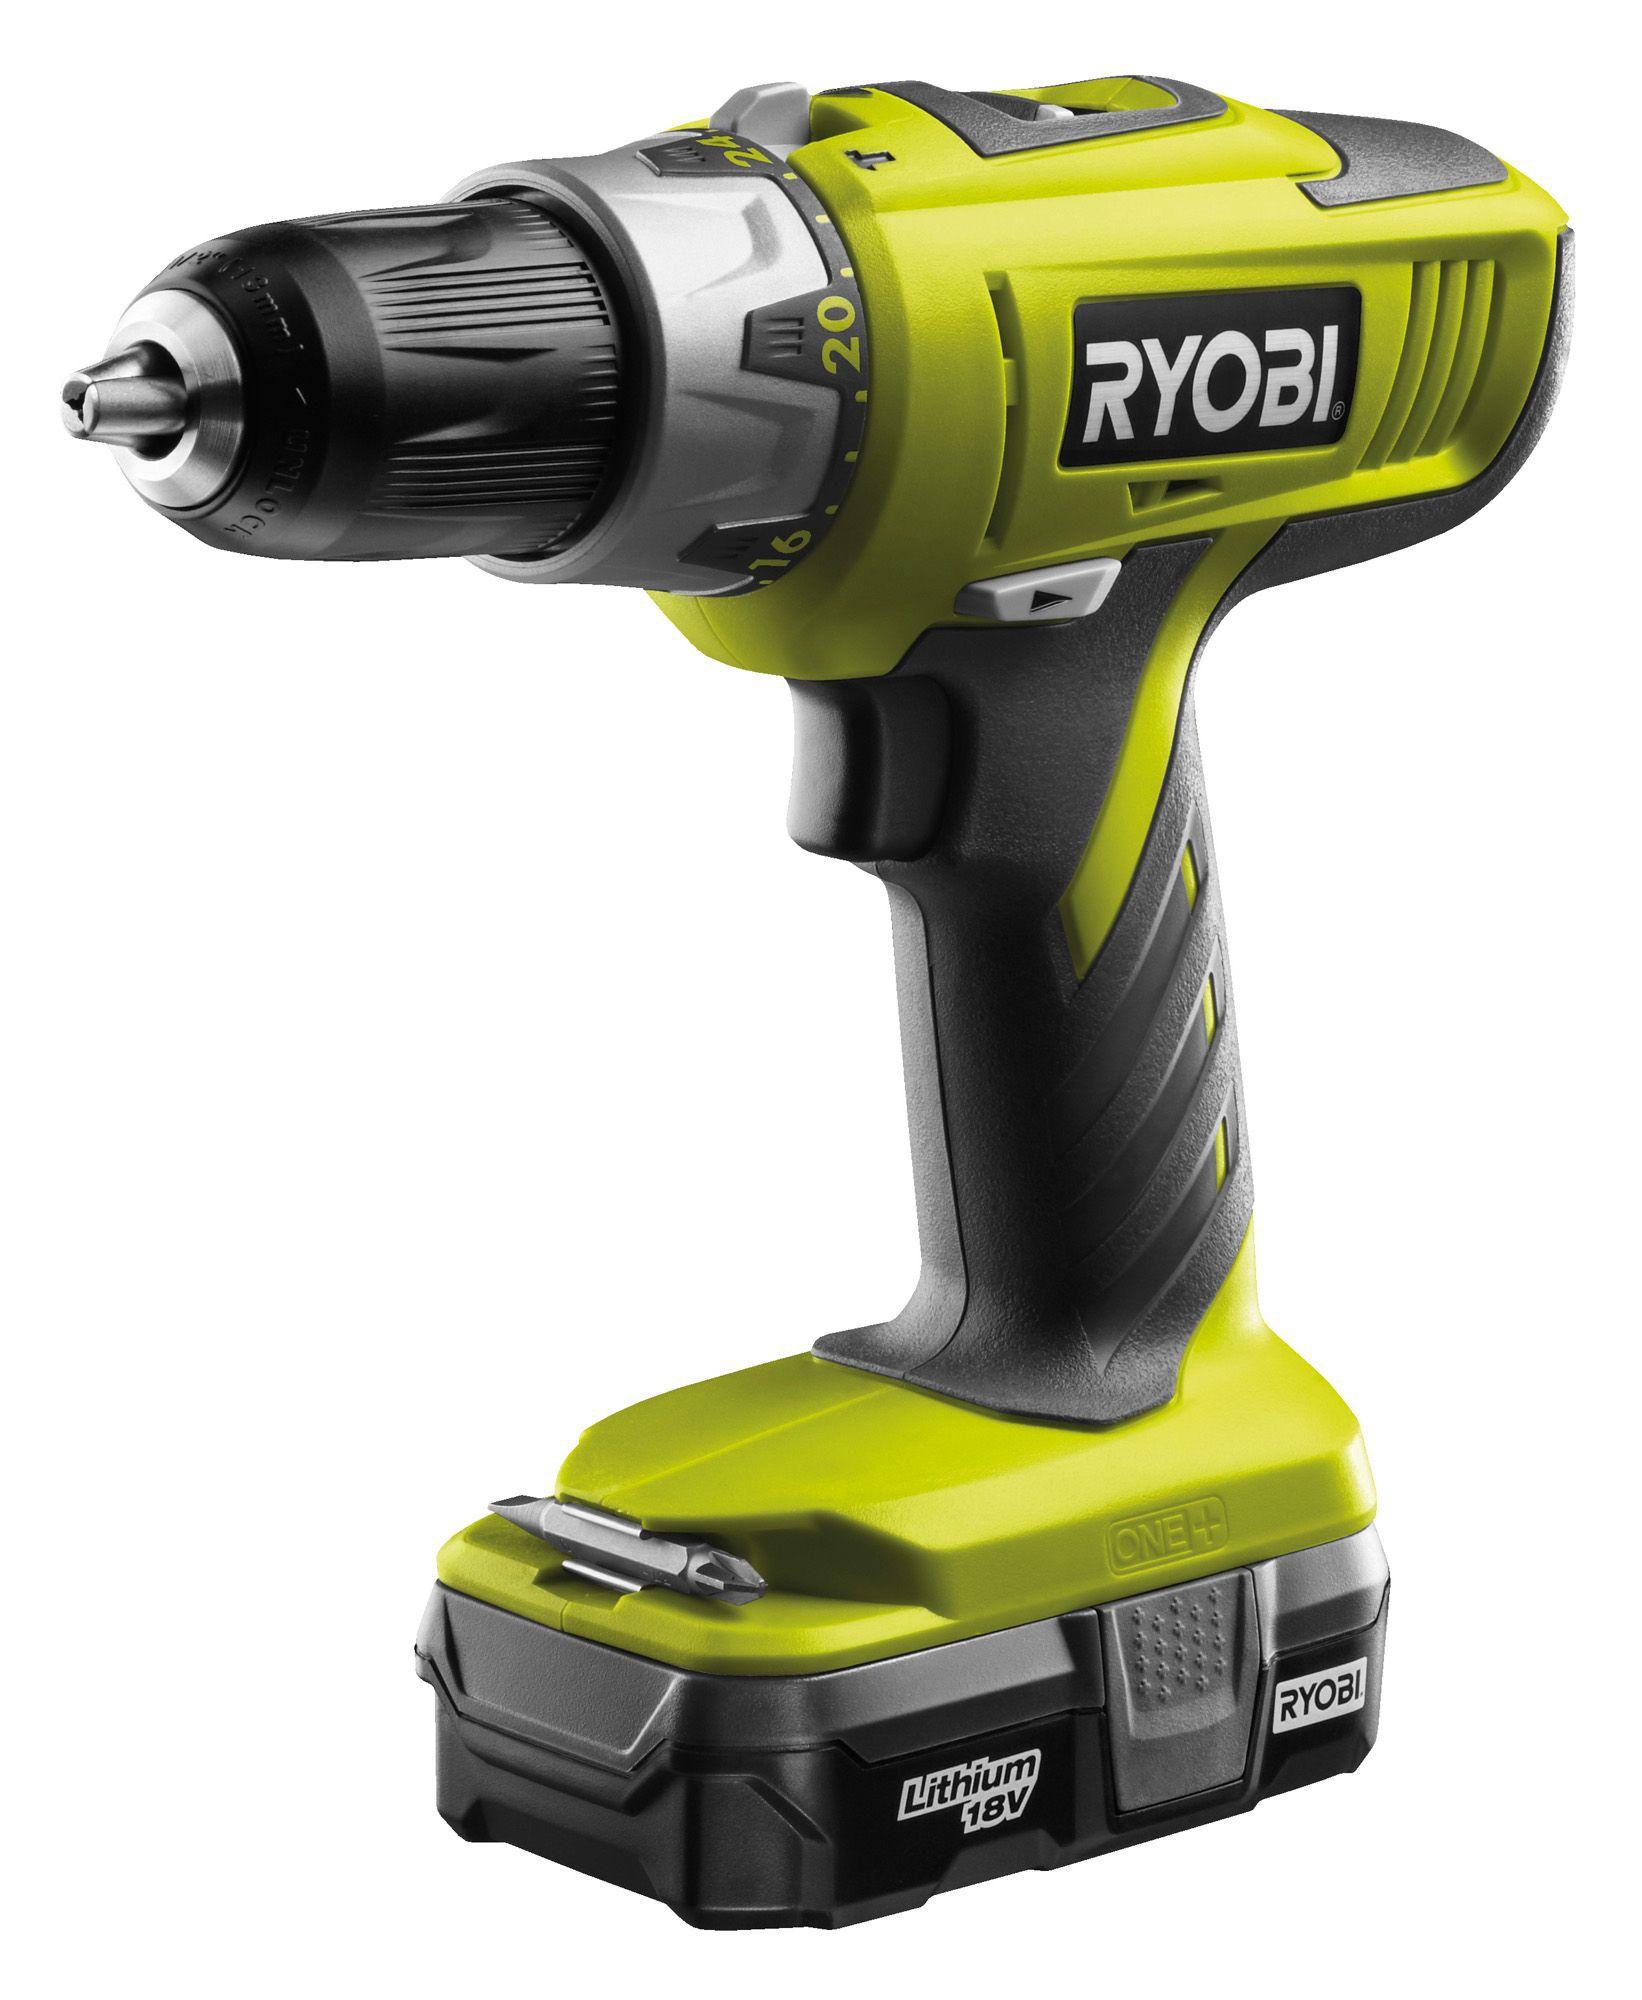 Ryobi One+ Cordless 18v 1.3ah Li-ion Combi Drill 1 Battery Llcdi1802-l13g